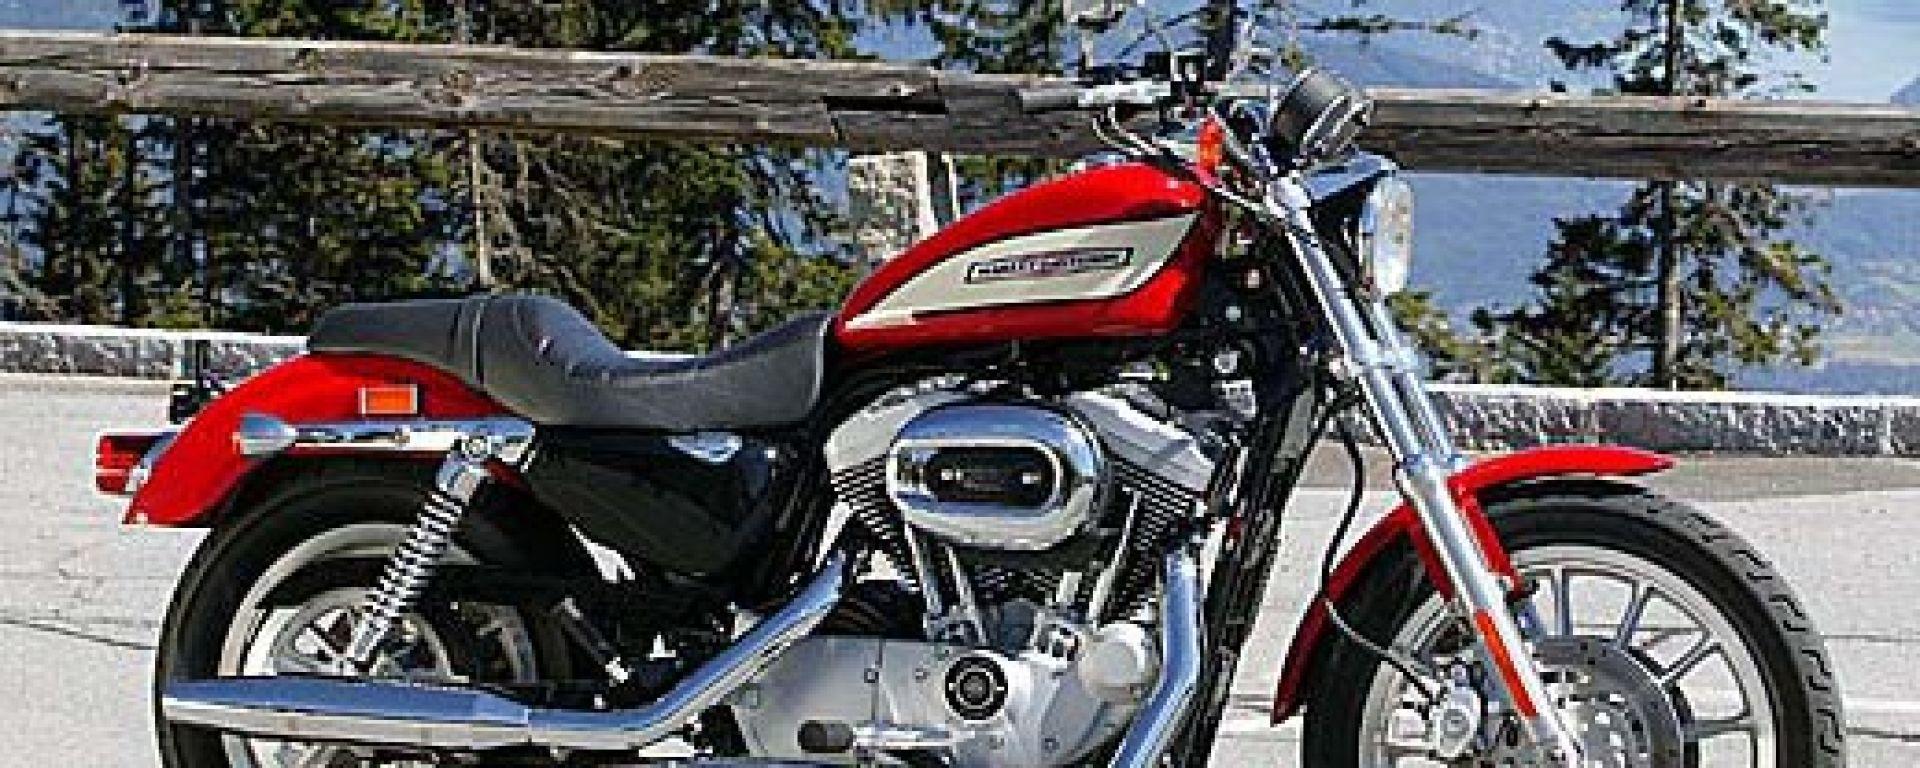 Harley Davidson Sportster R